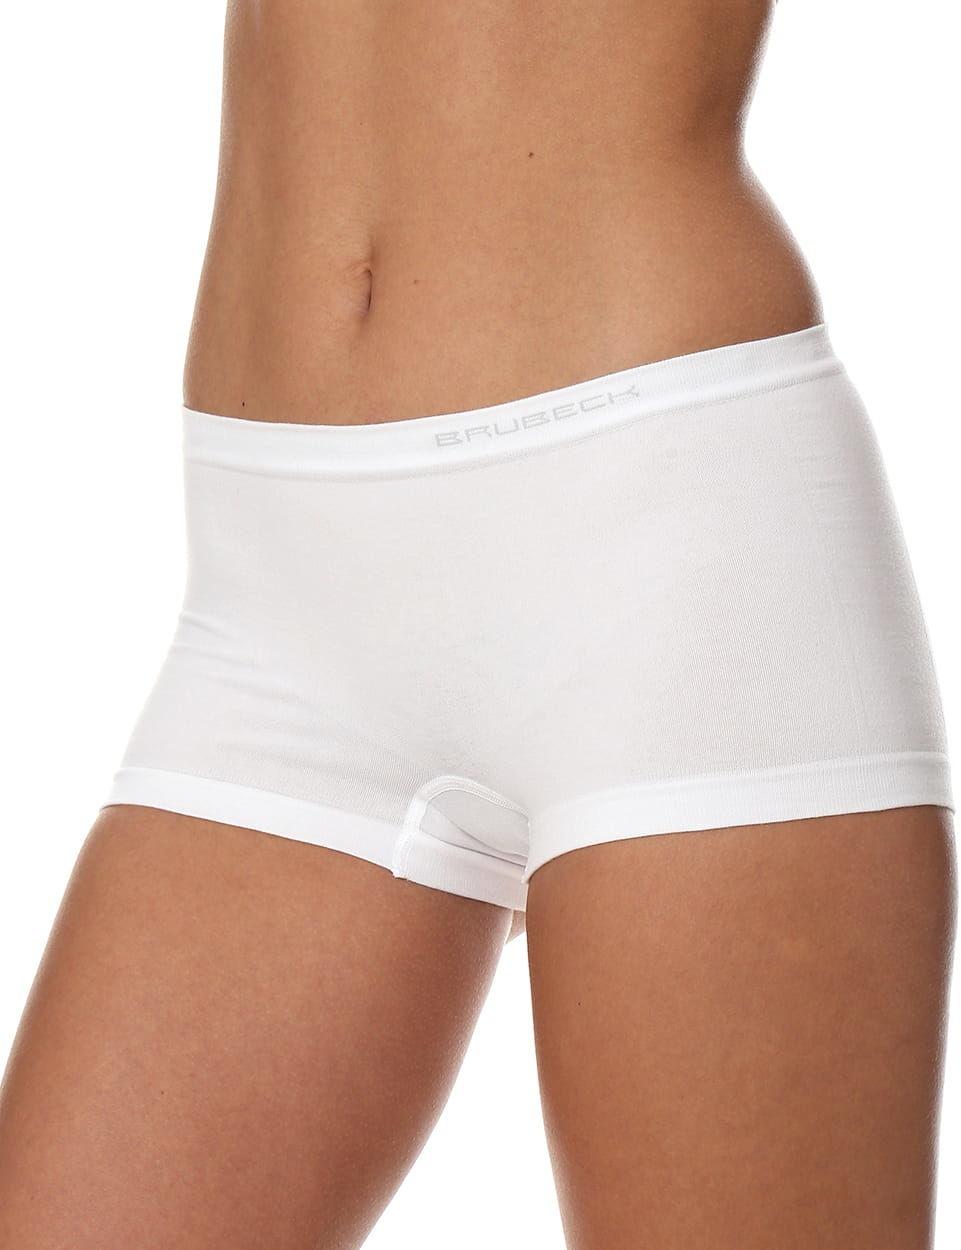 Bokserki damskie Brubeck Comfort Cotton BX10470 białe